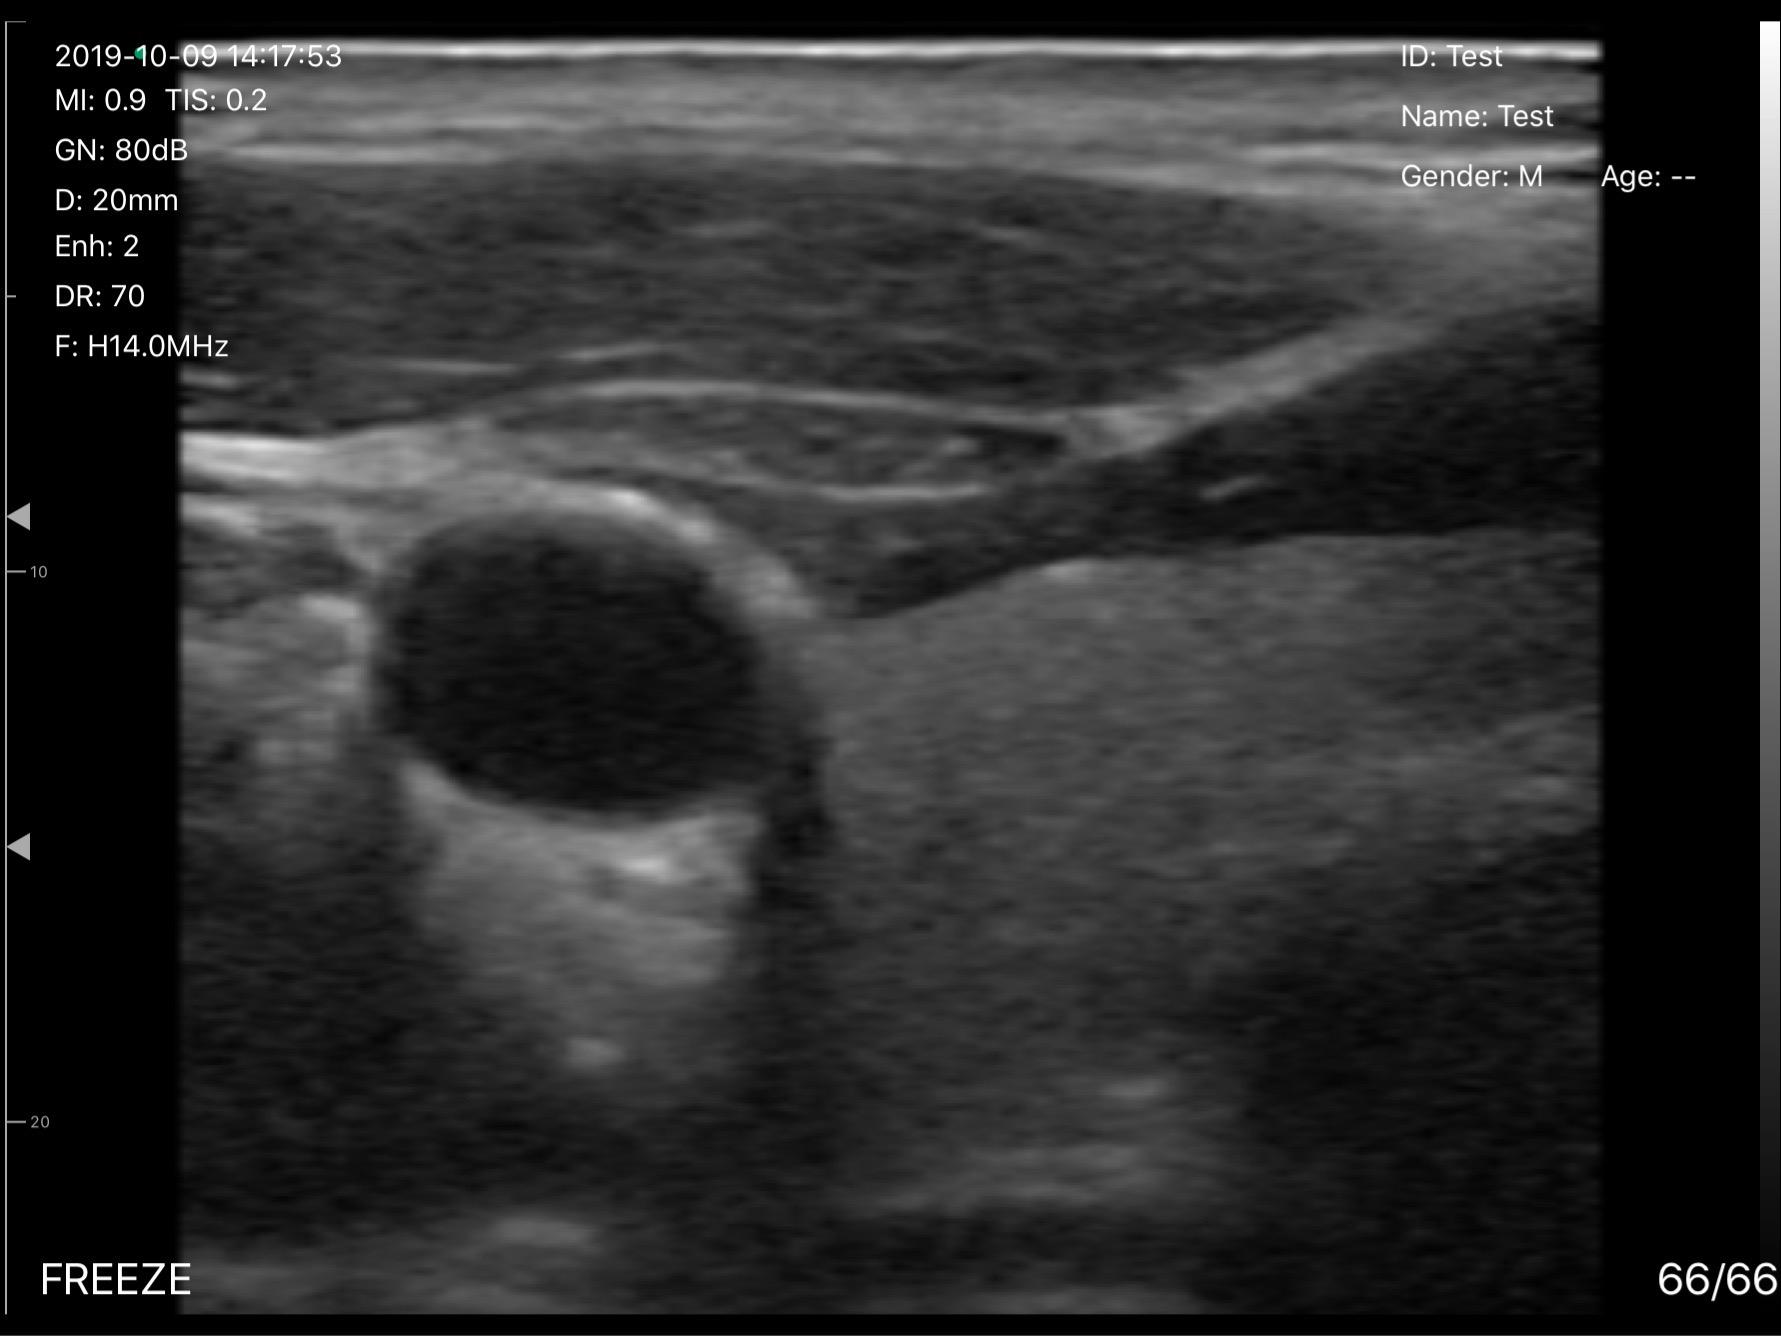 UProbe-L5PC-Transverse-View-of-Thyroid